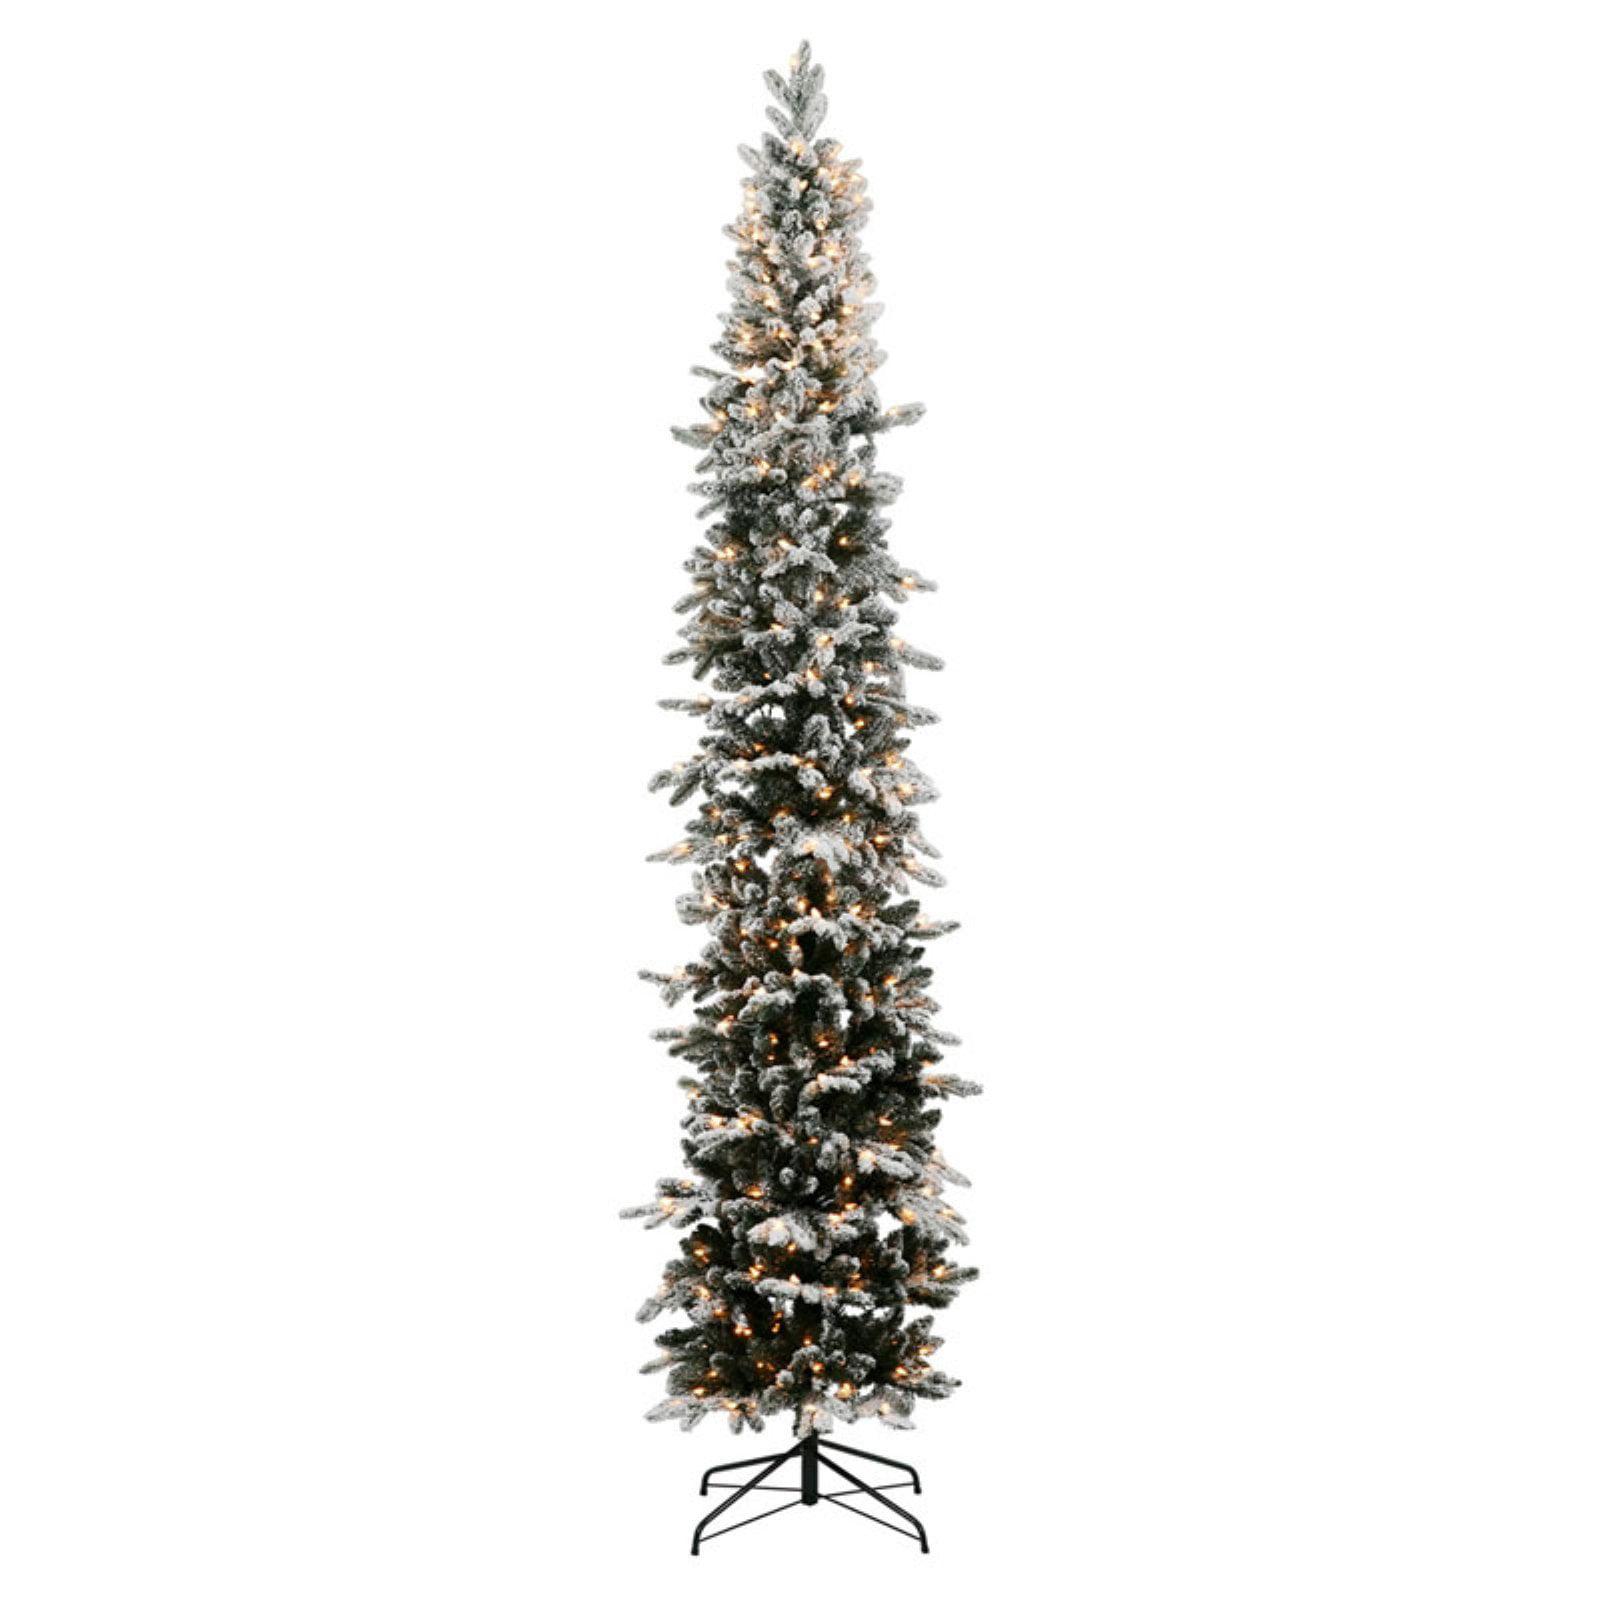 Tannenbaum Led.Vickerman Flocked Tannenbaum Led Pre Lit Christmas Tree